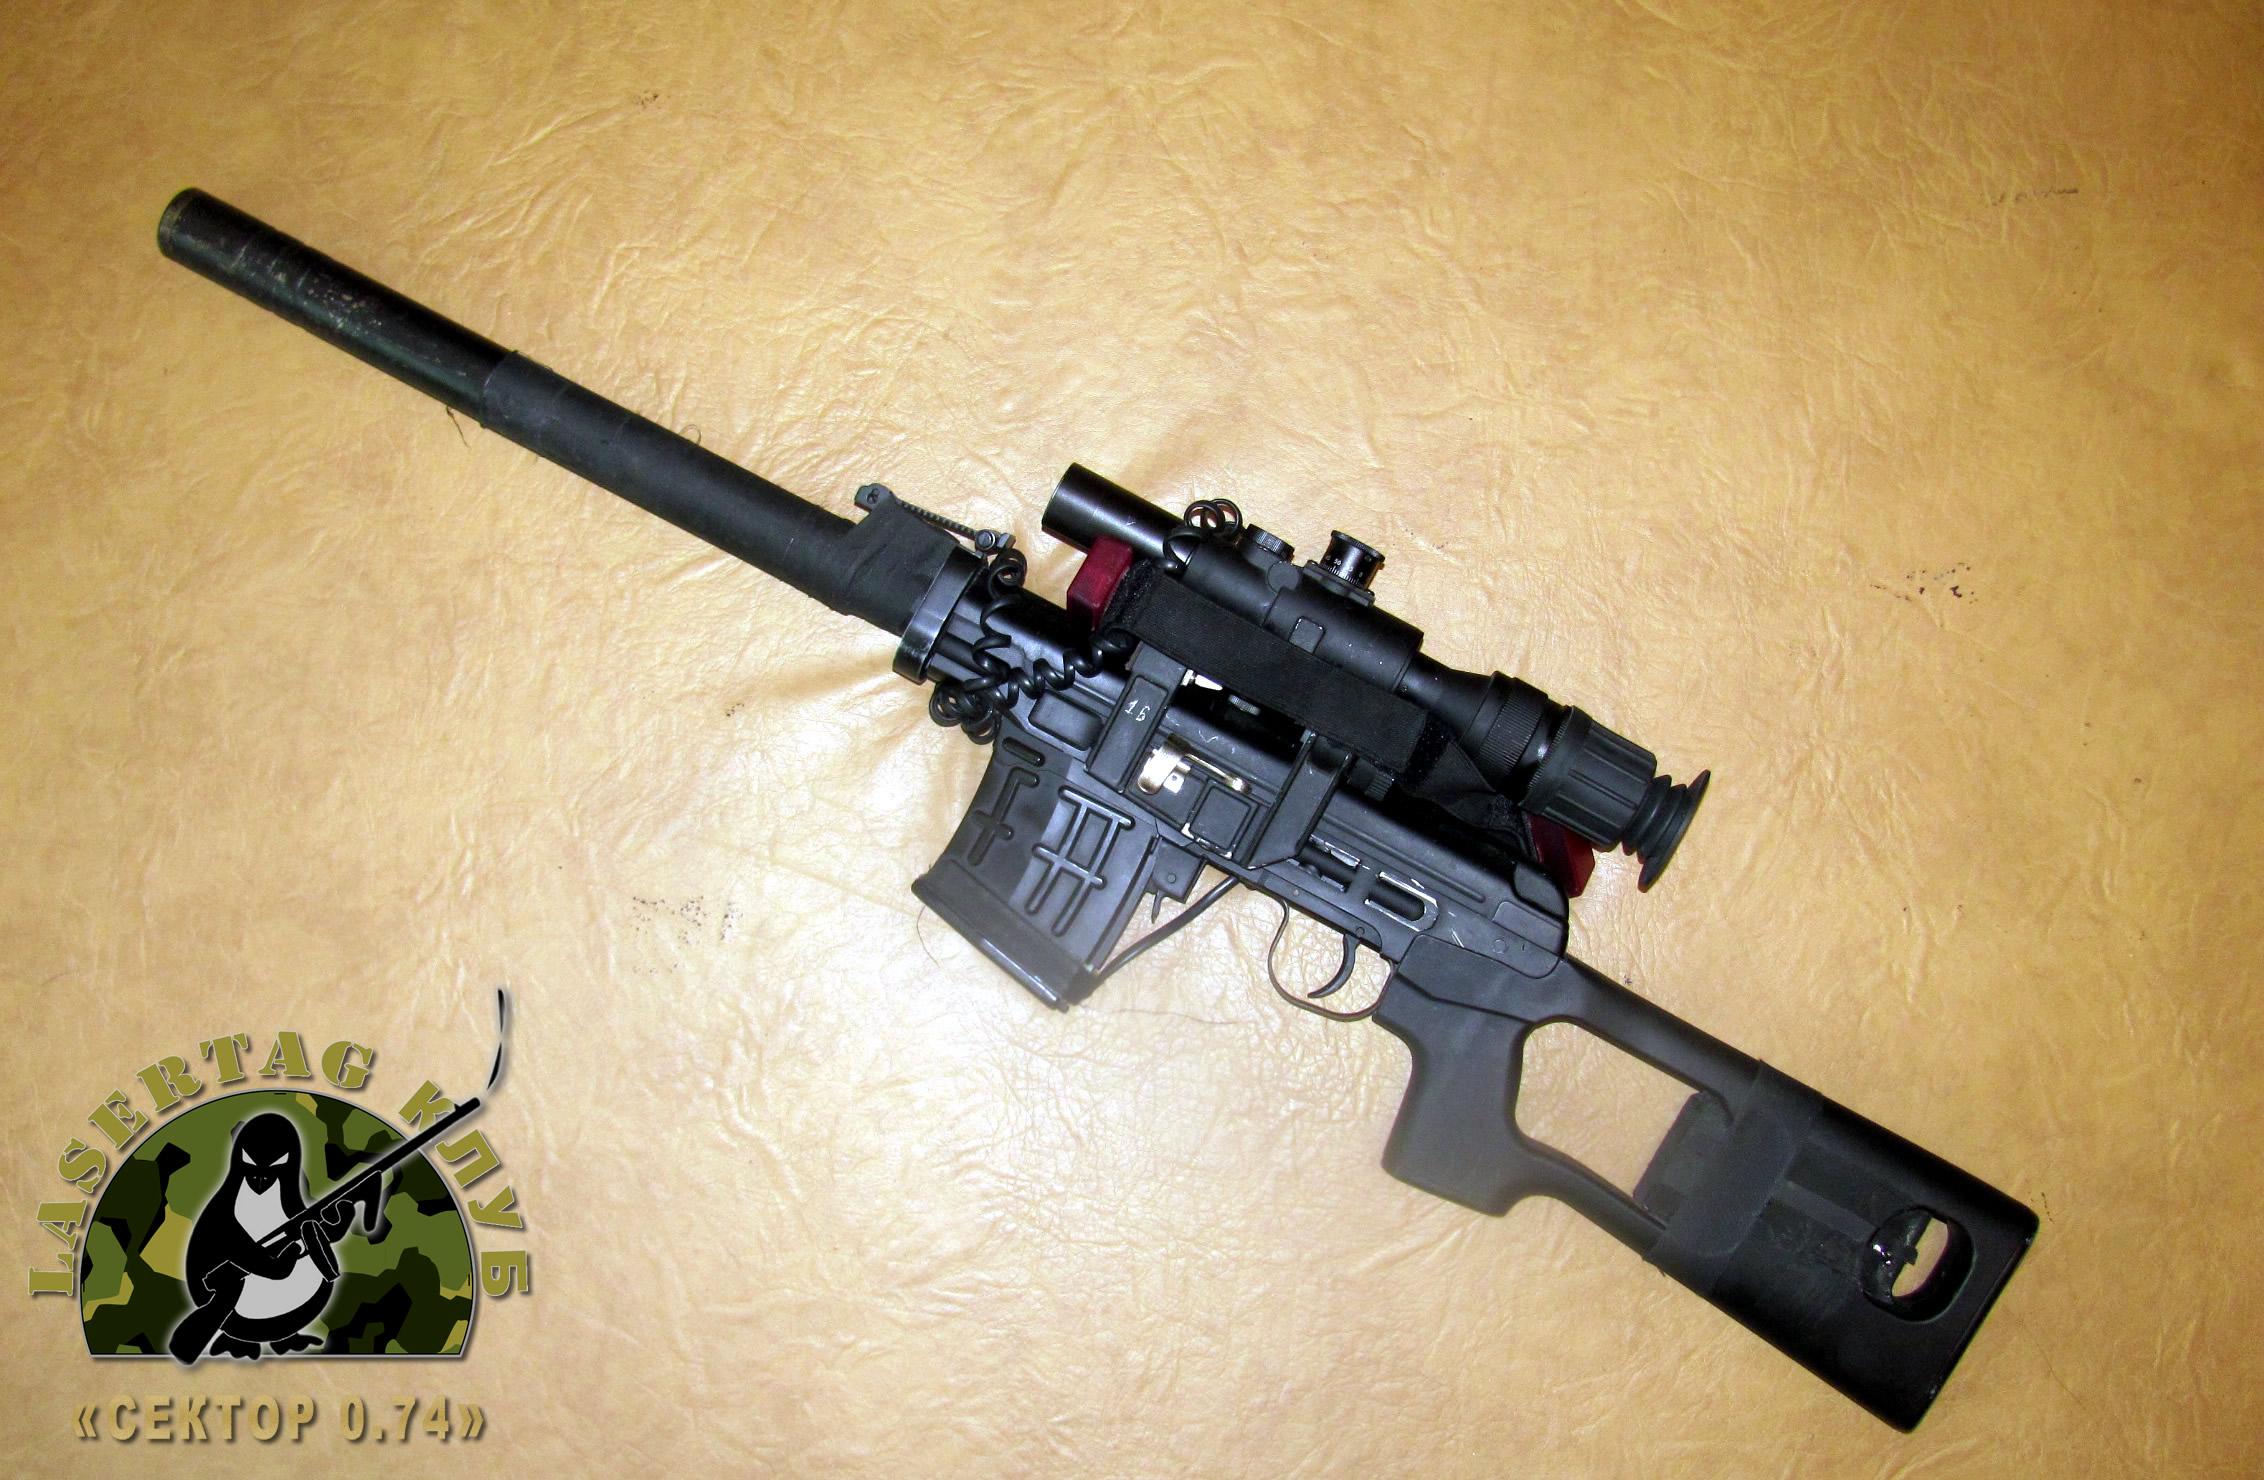 ВСС ВАЛ (прототип винтовки СВД) -2 шт.